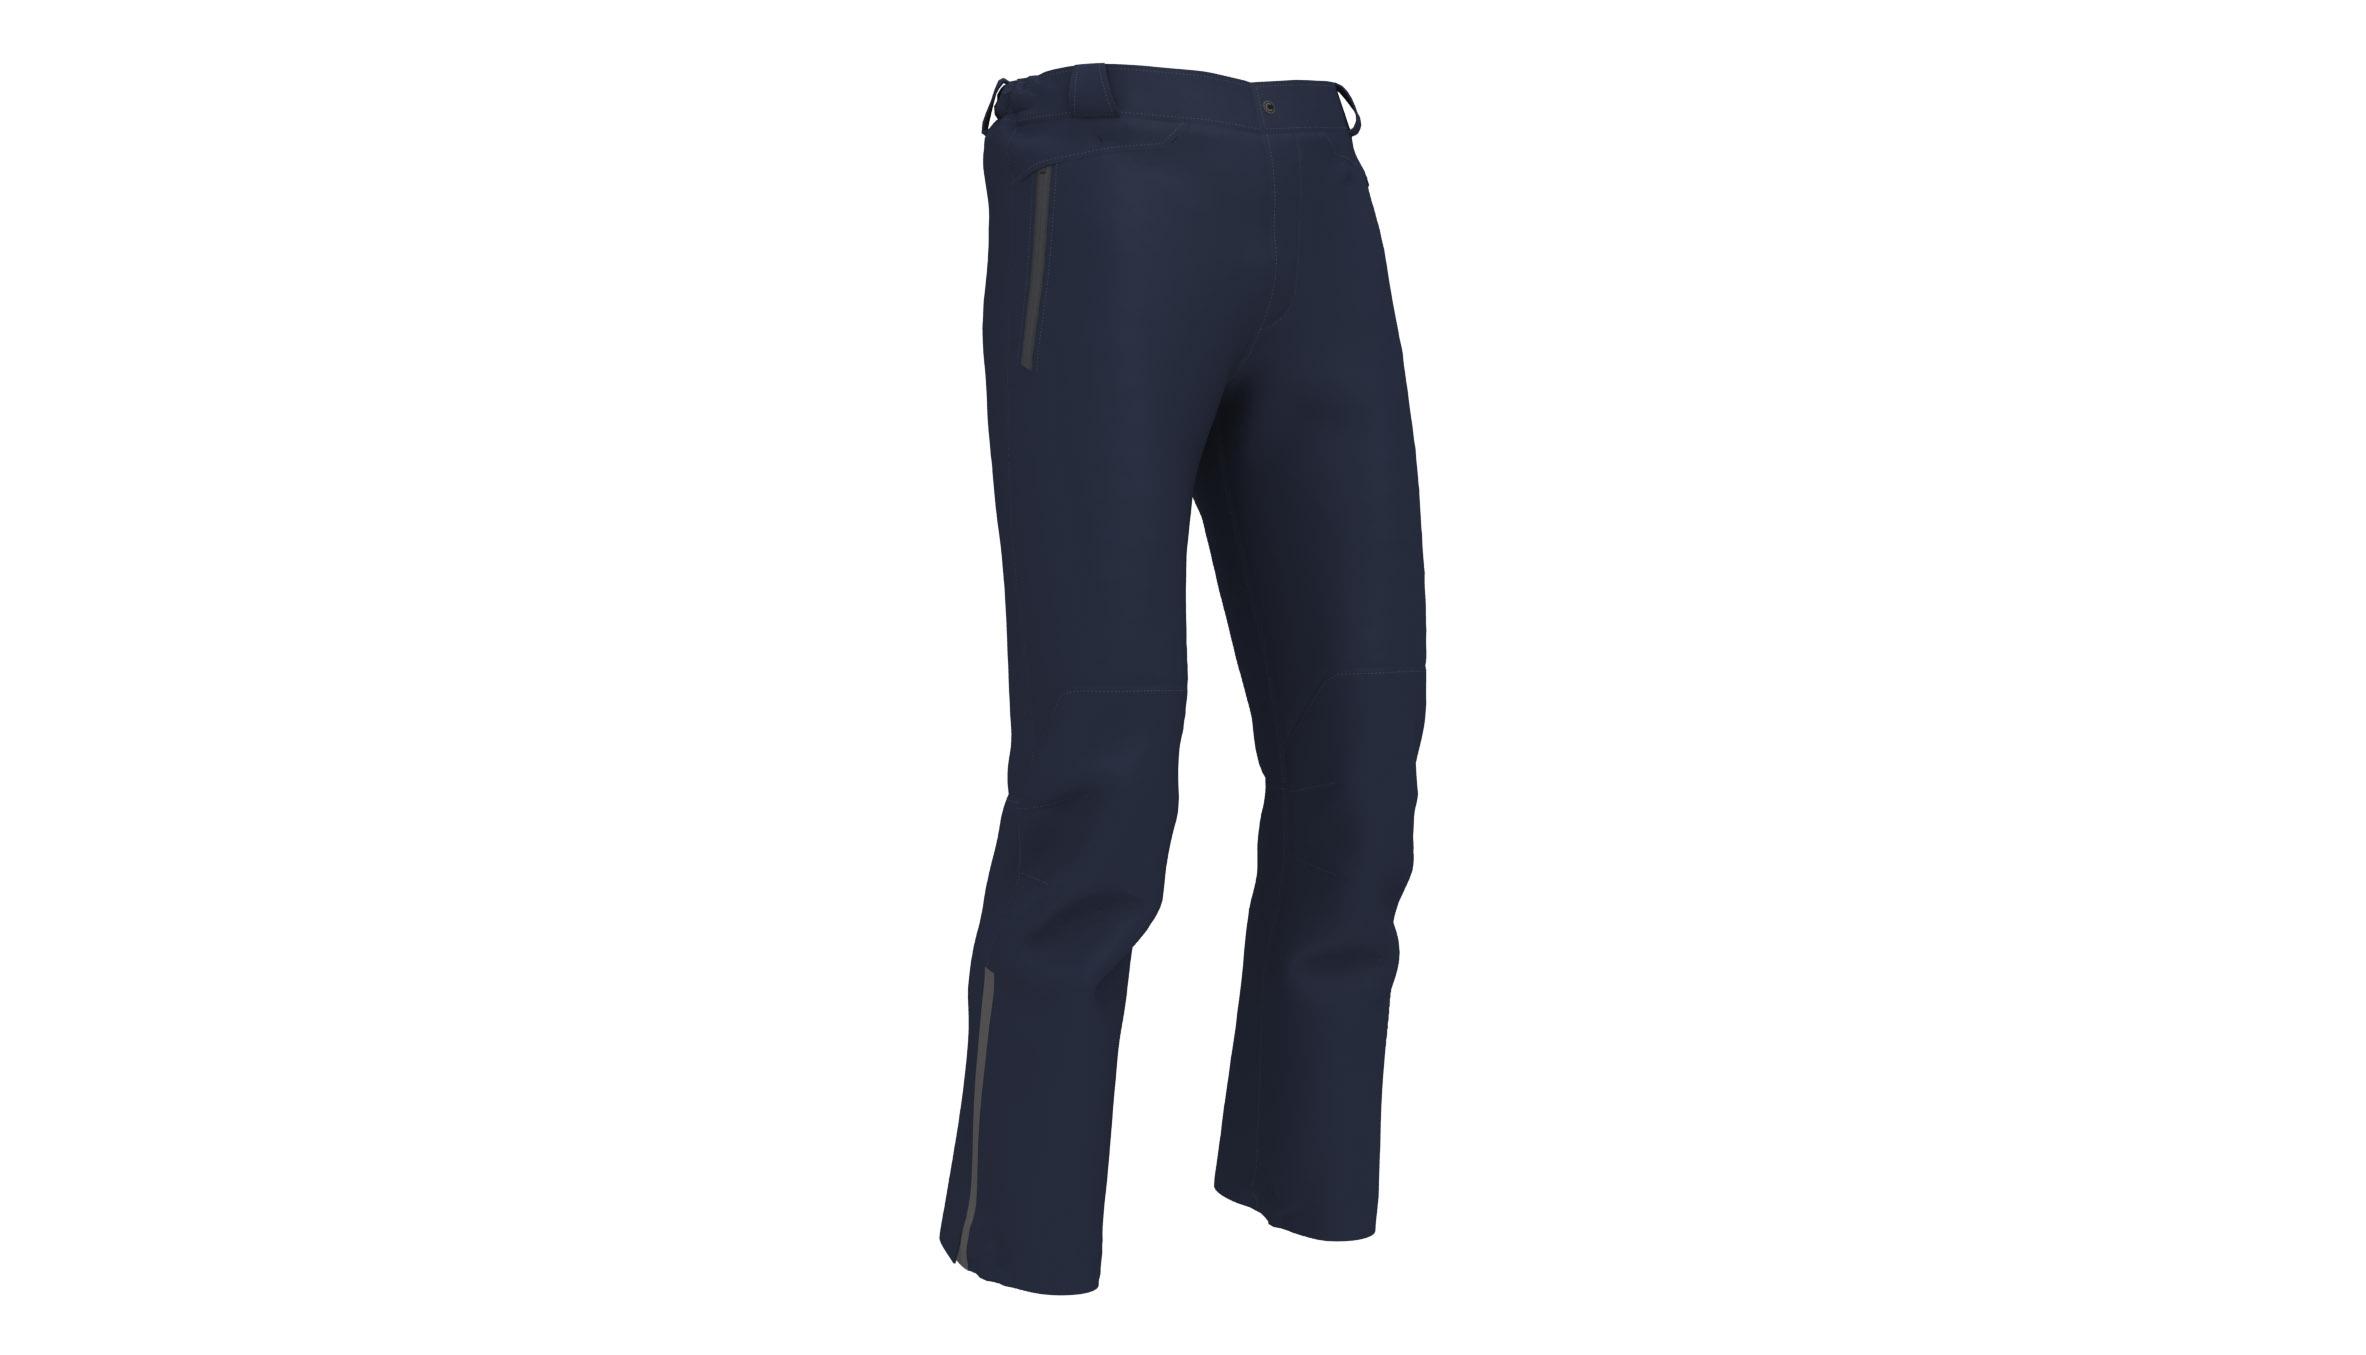 Colmar MENS STRETCH SALOPETTE, muška skijaška jakna, plava